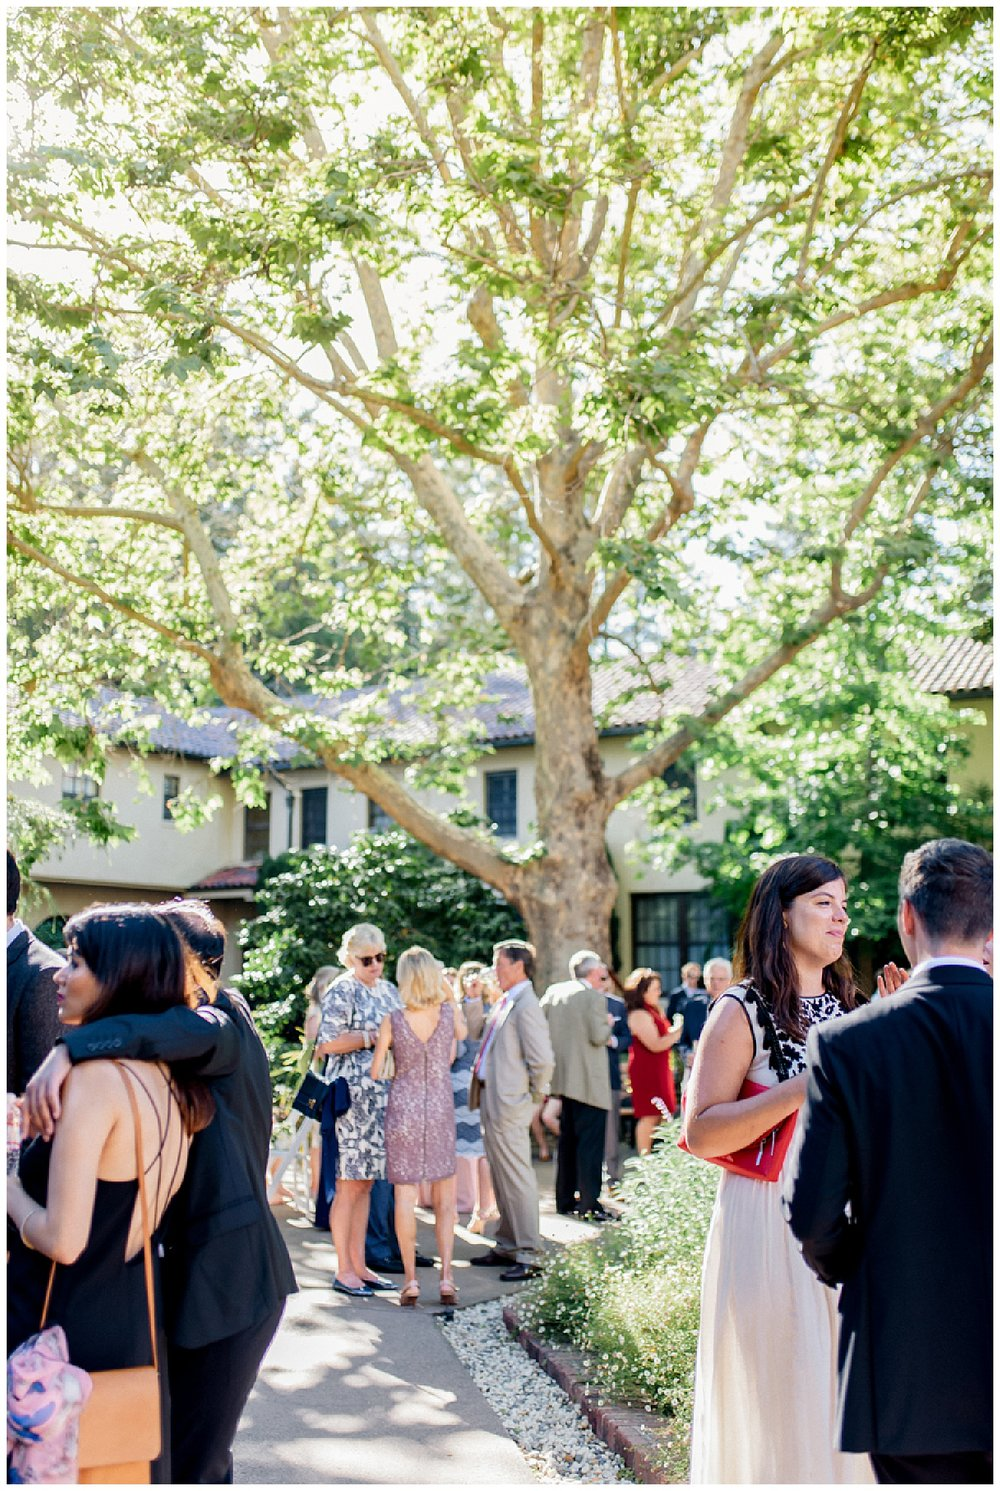 Janine_Licare_Photography_San_Francisco_Wedding_Photographer_0157.jpg